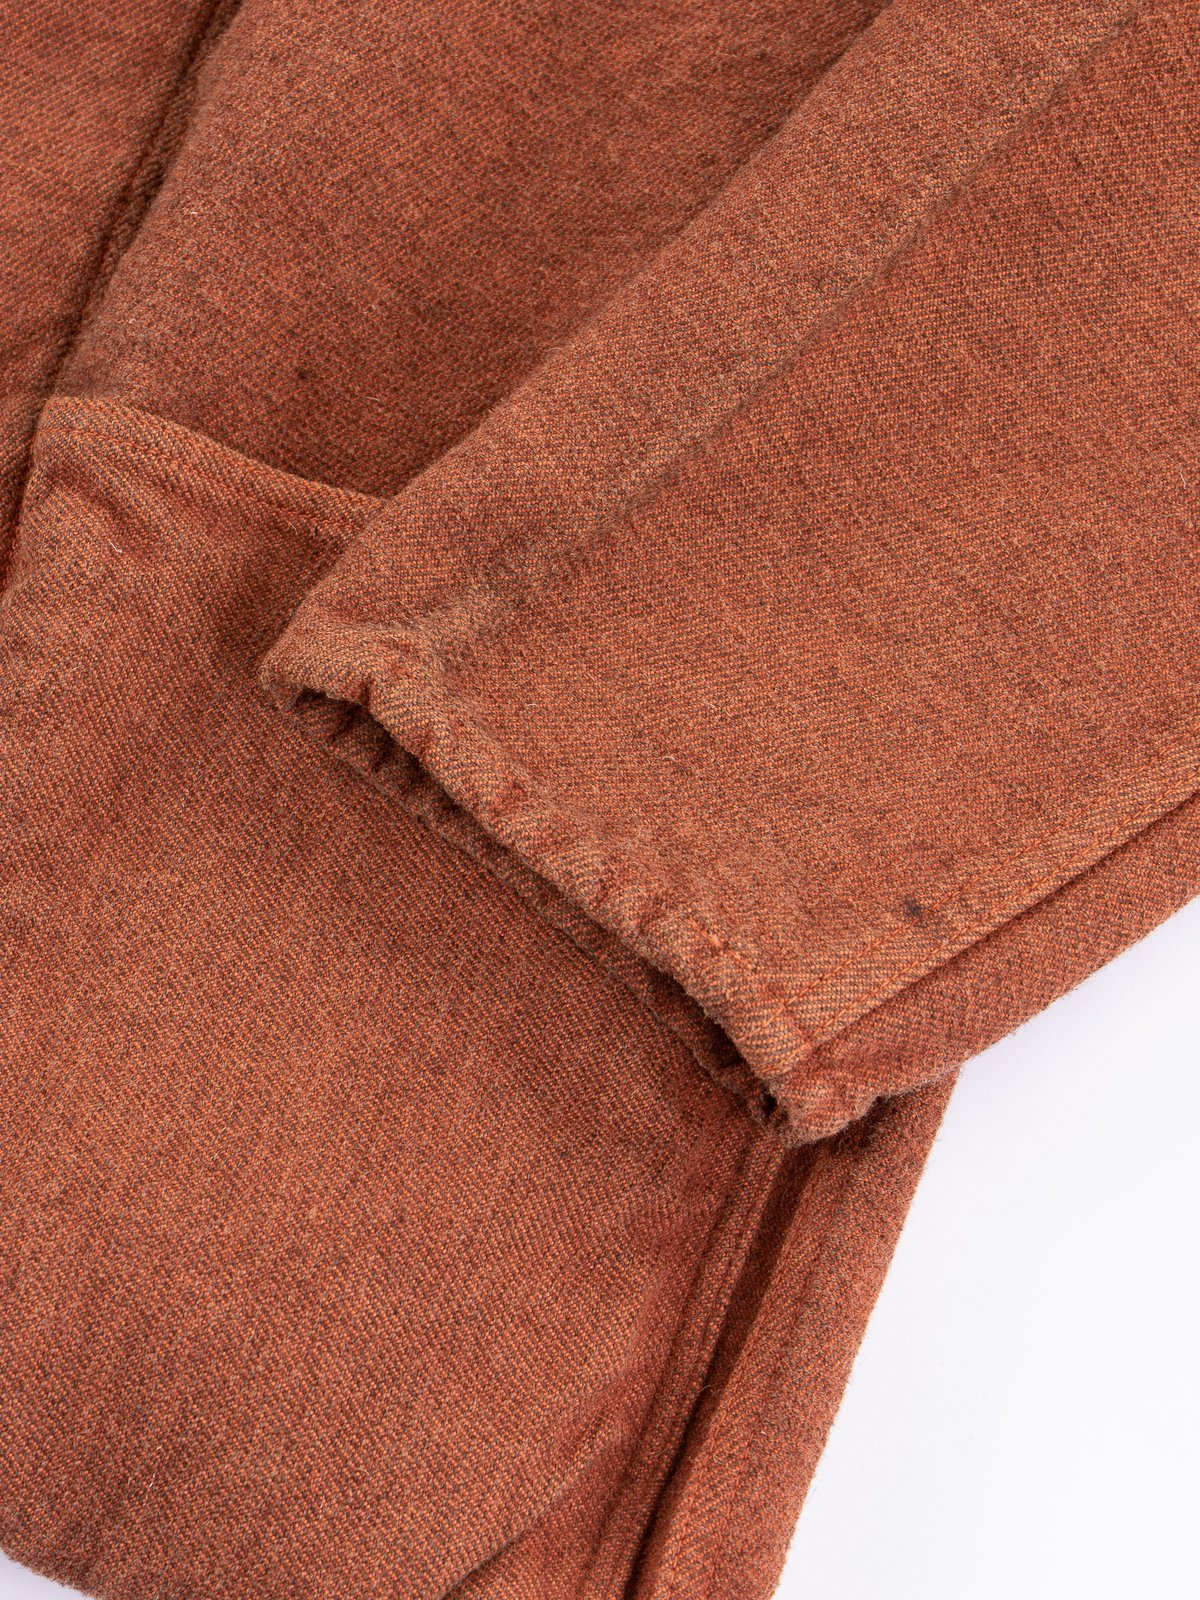 Red Ochre Dye Collared Shepherd's Coat - Image 5